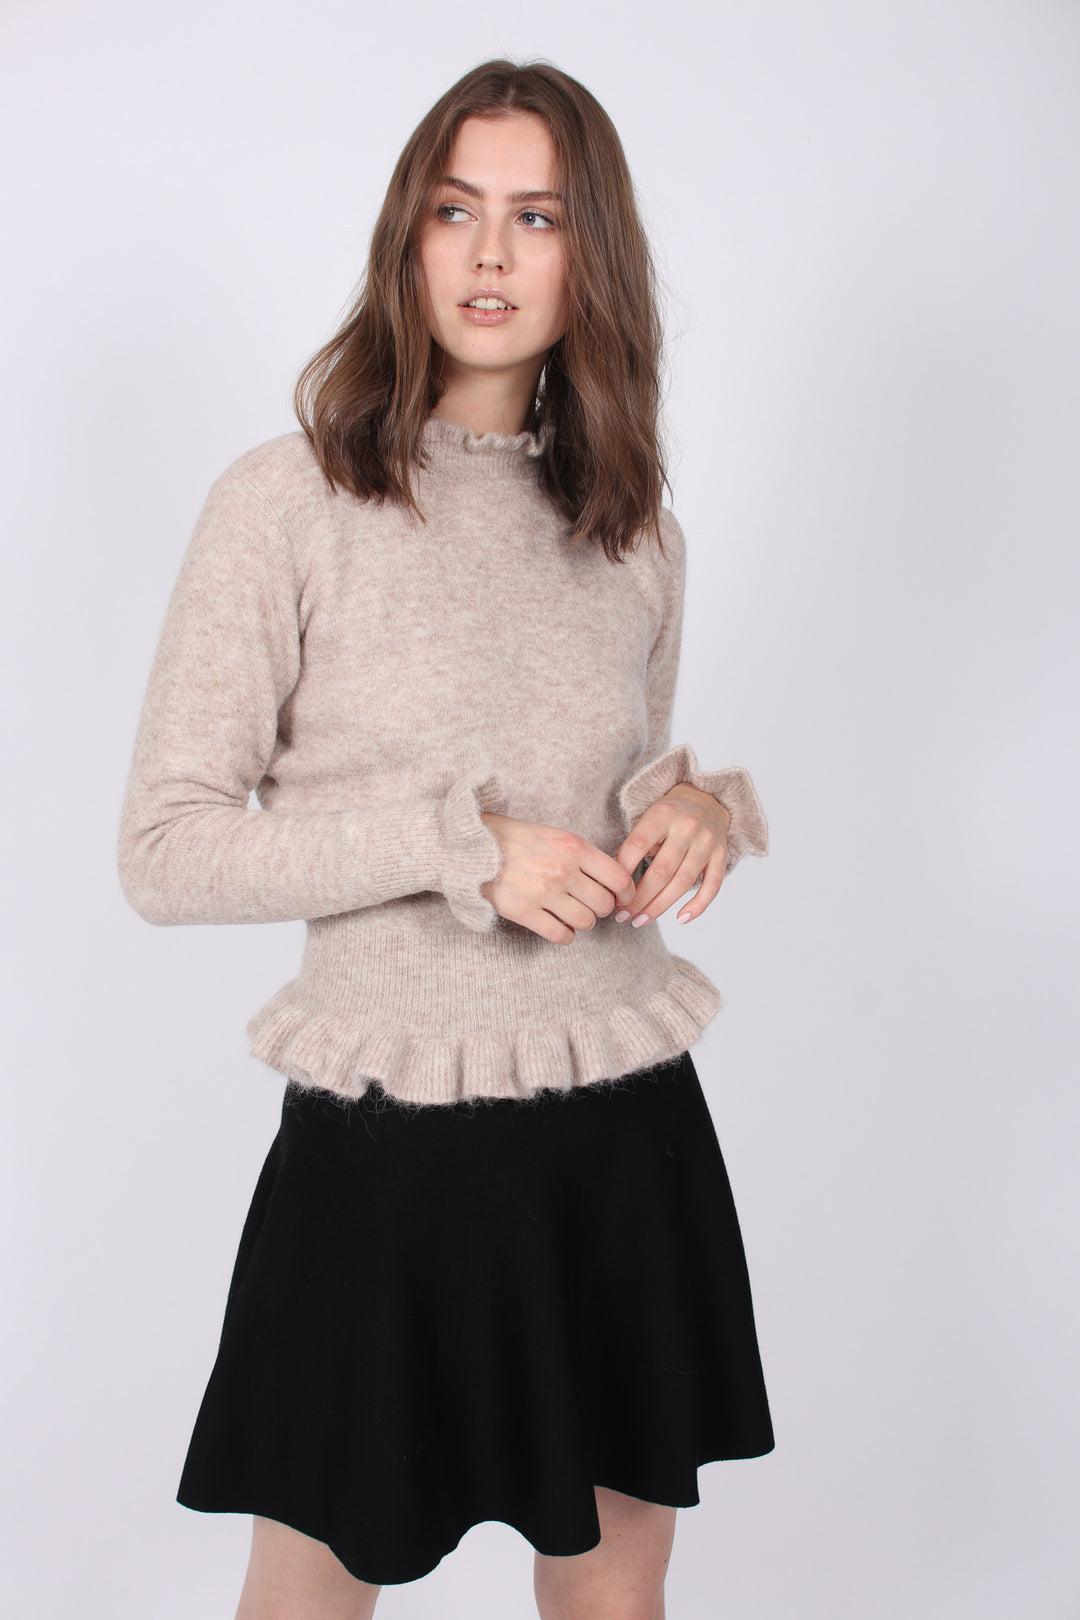 Ella & il | Triny Merino Skirt Black | VILLOID.no